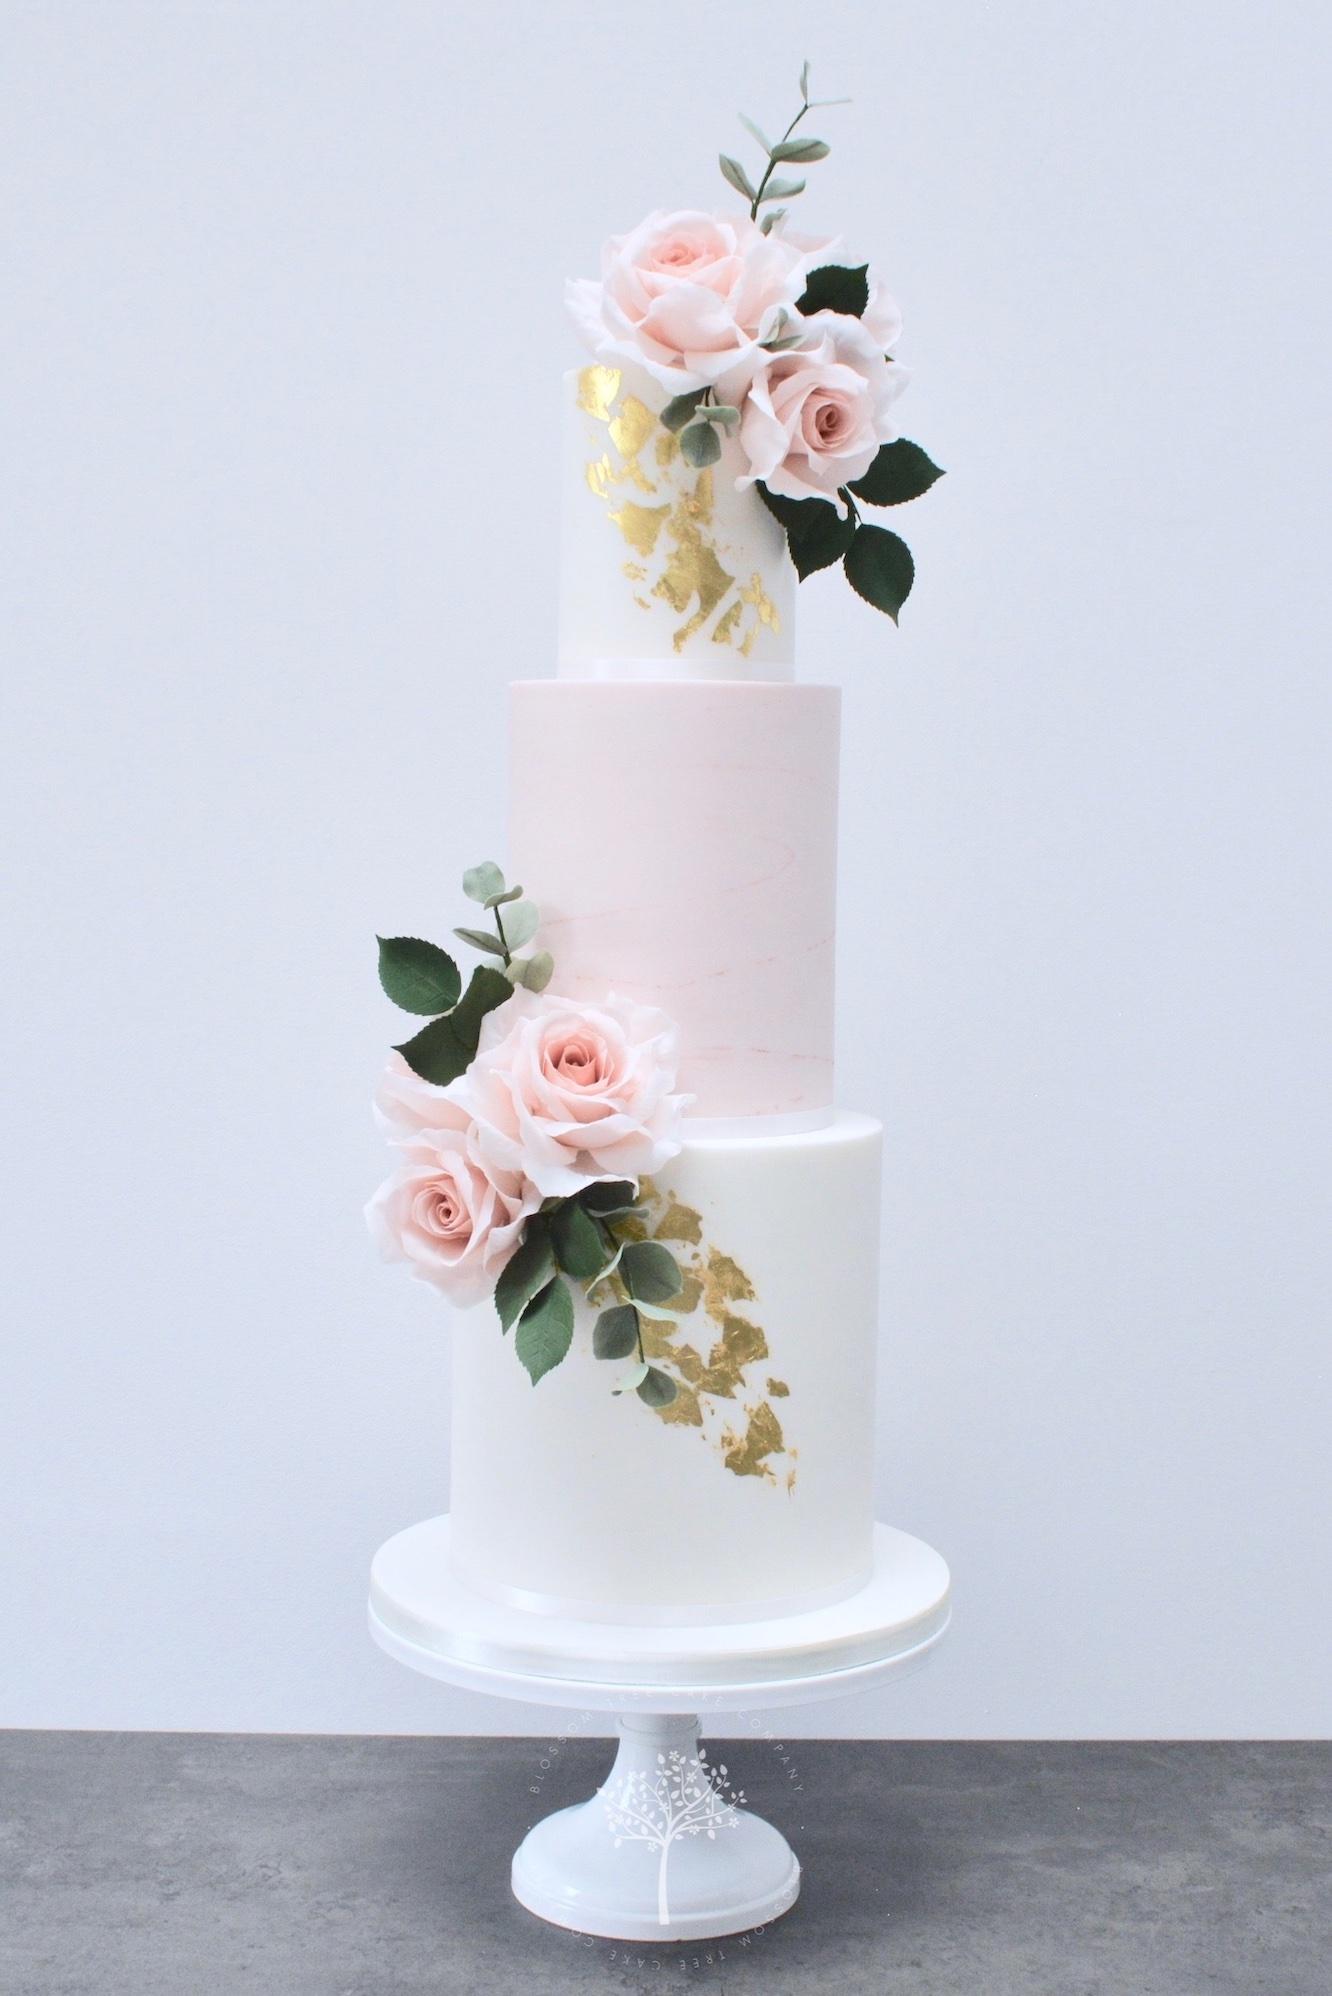 Dusky Pink & Gold wedding cake by Blossom Tree Cake Company Harrogate North Yorkshire.jpg